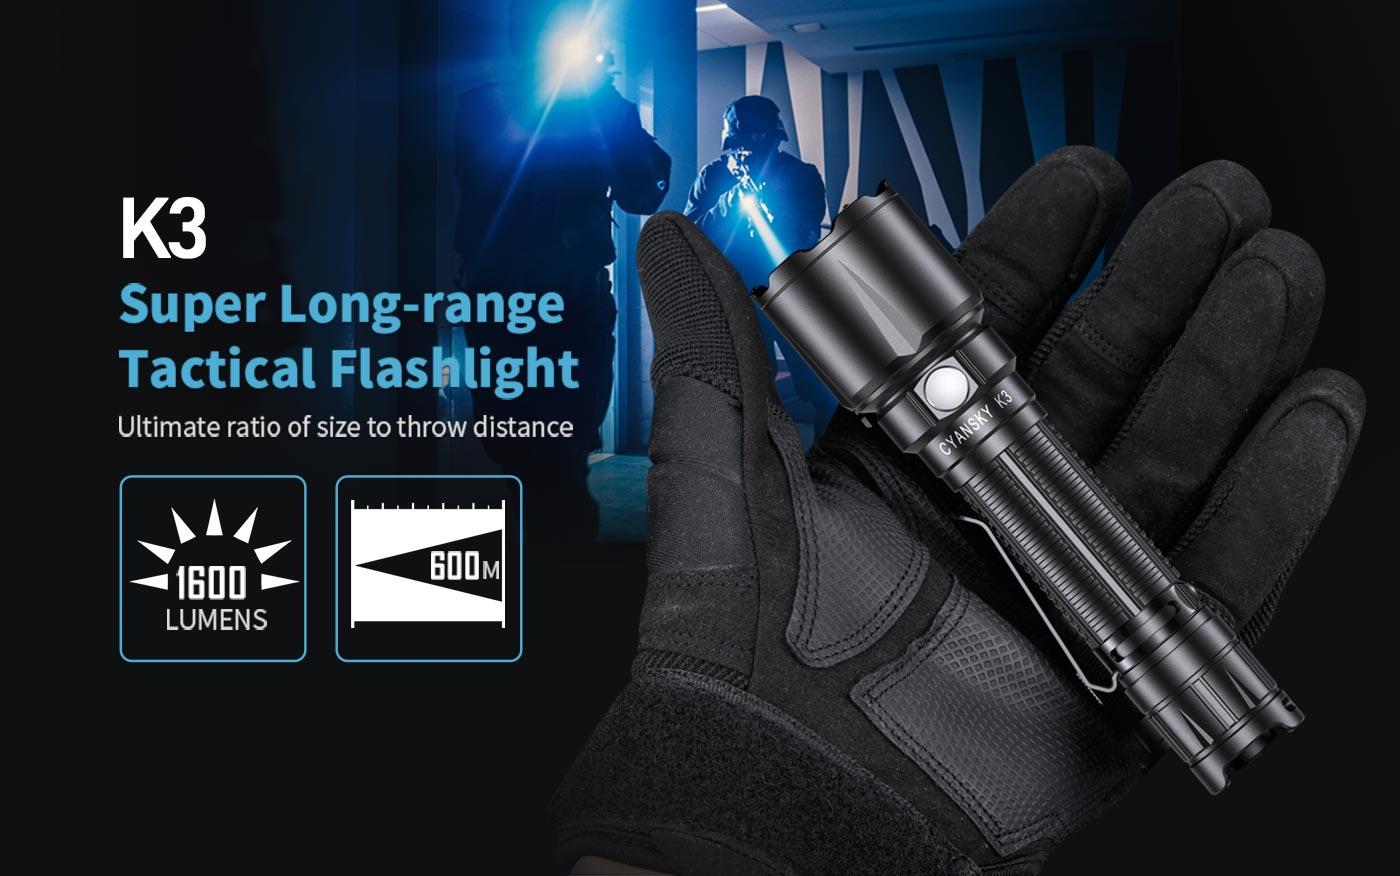 search rescue torch, self defense flashlight, brightest tactical flashlight